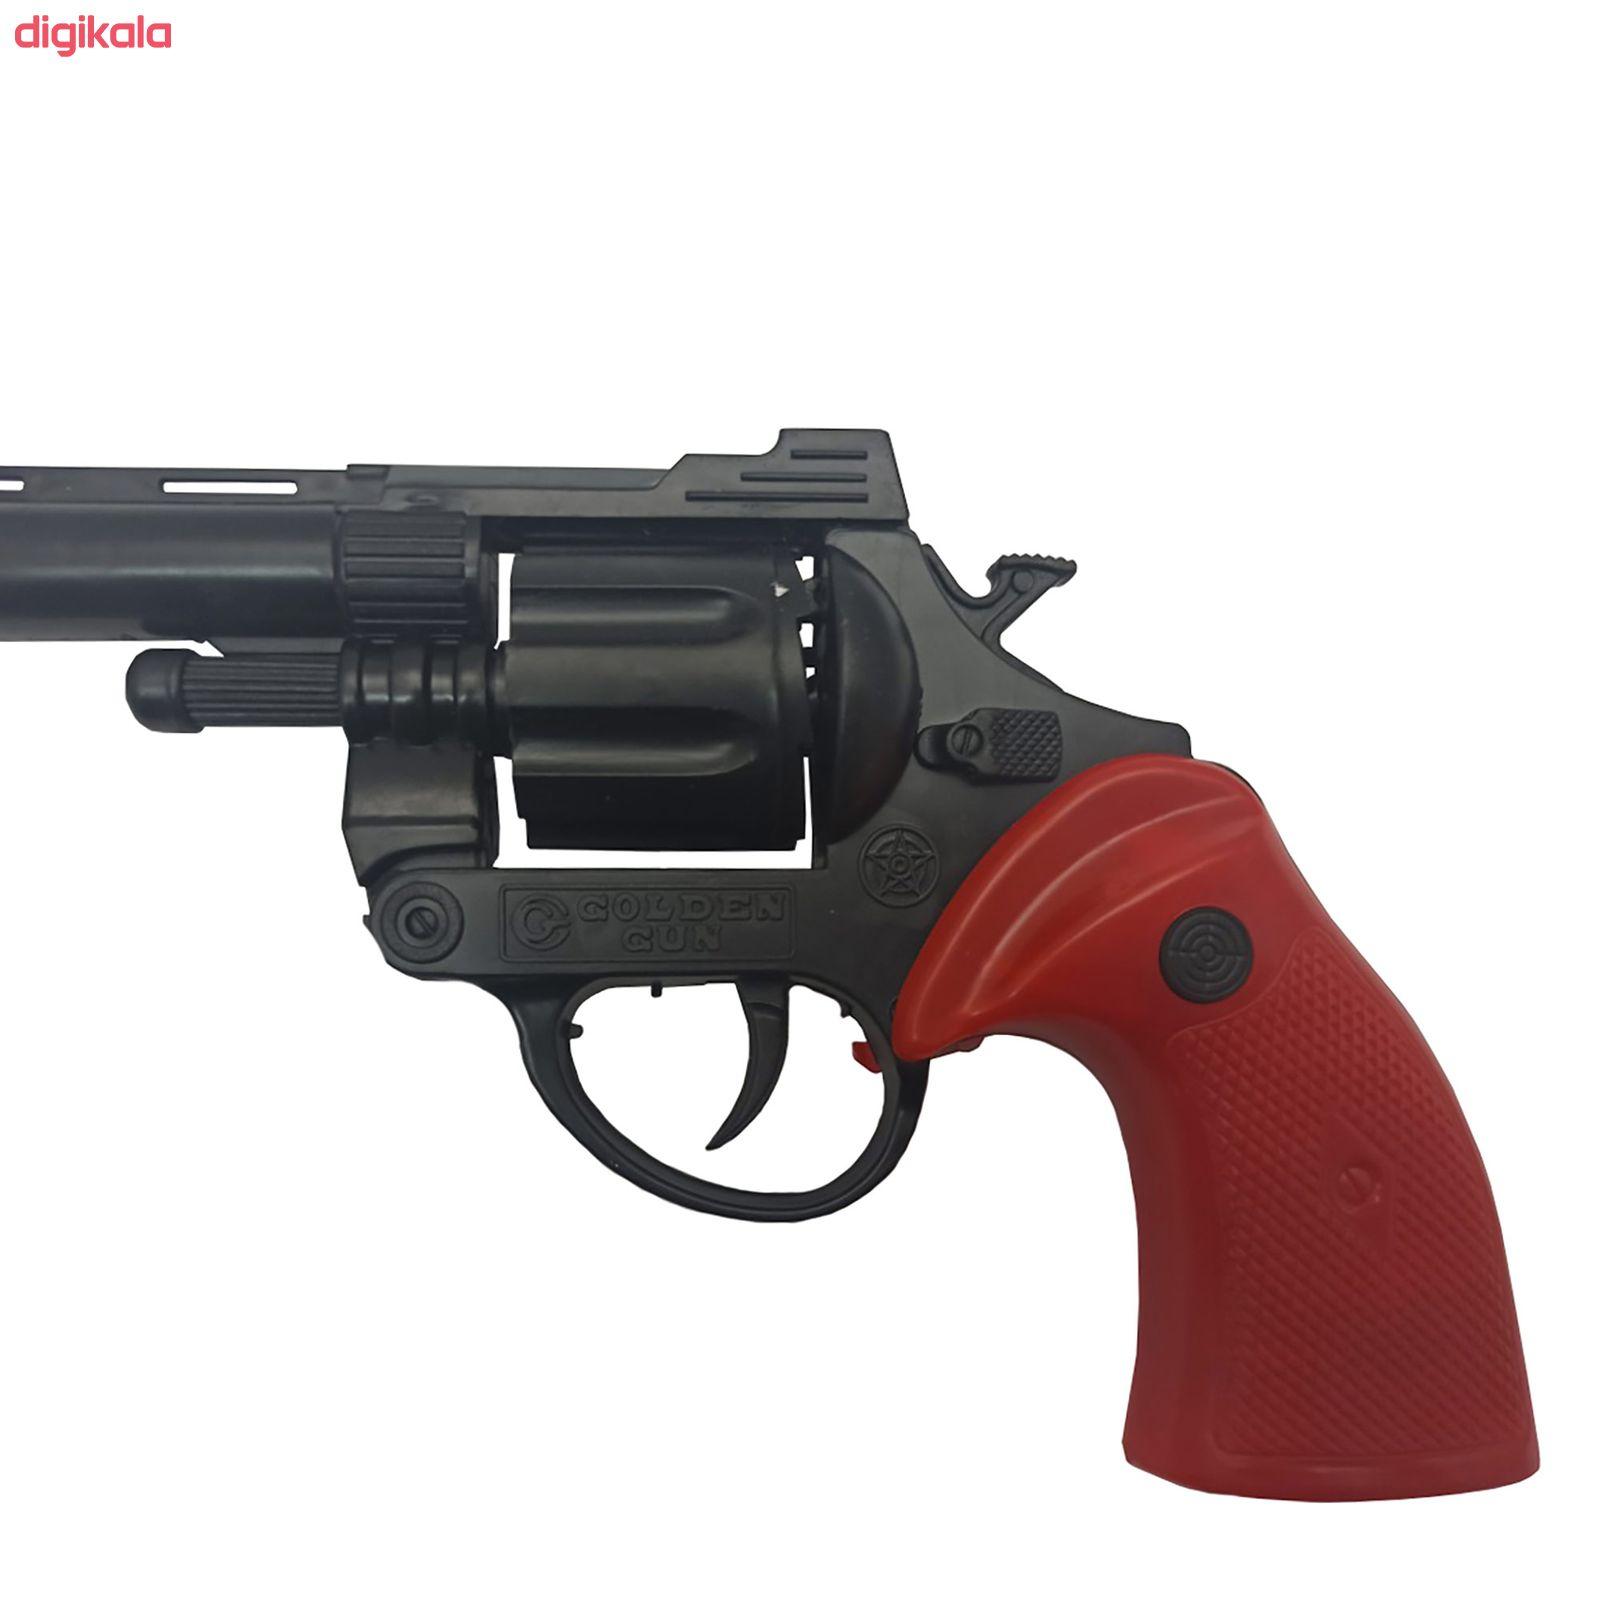 تفنگ بازی گلدن گان مدل naabsell-p70 مجموعه 3 عددی main 1 2